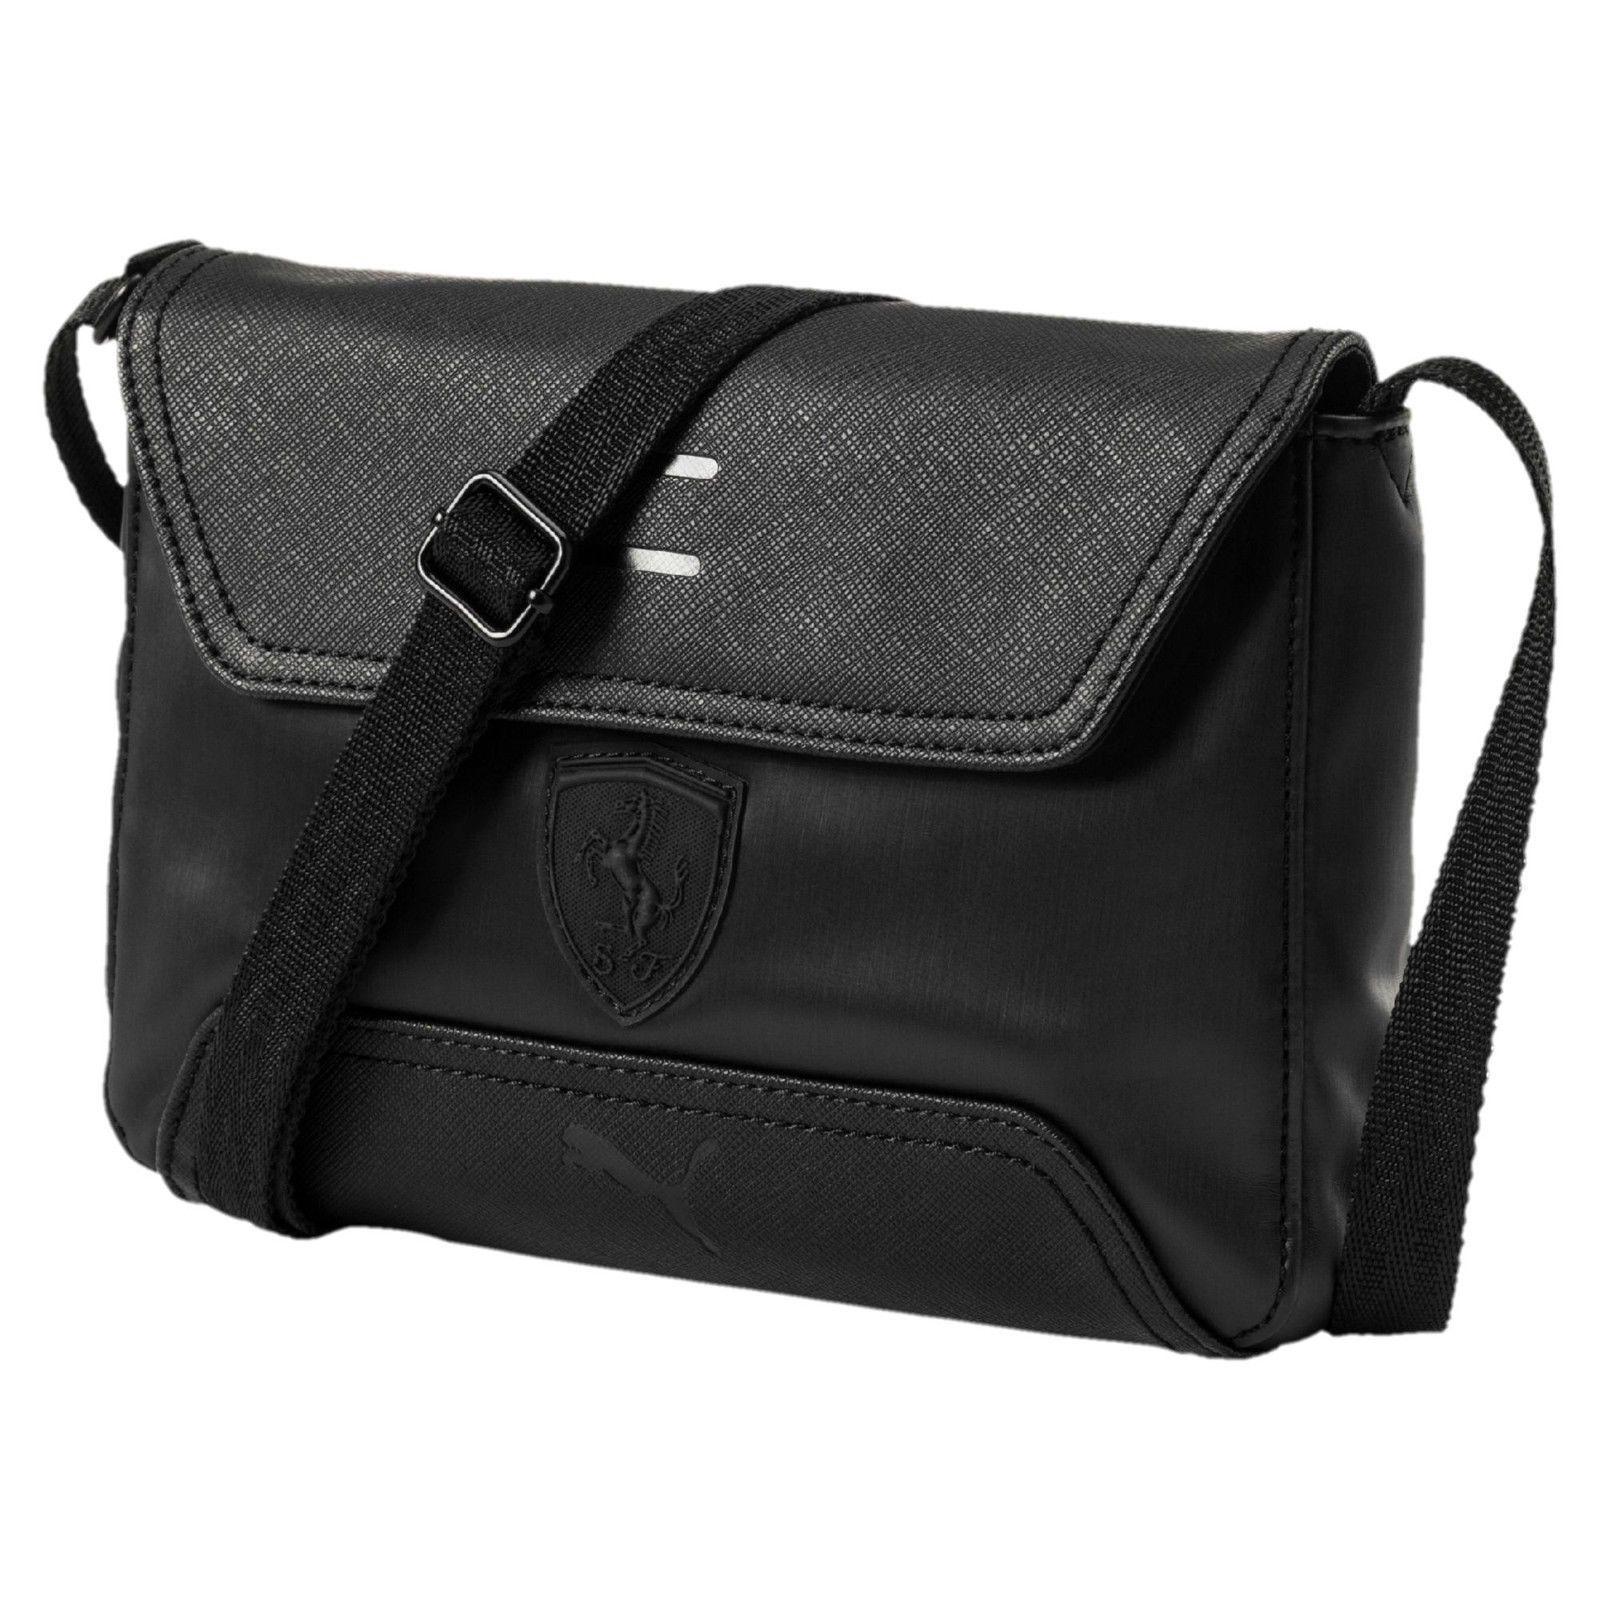 5cd3c7ff016a ... puma ferrari handbags puma ferrari bag puma bags ferrari bag handbag  ideas 50% price adbf9  Puma ferrari replica black and ...